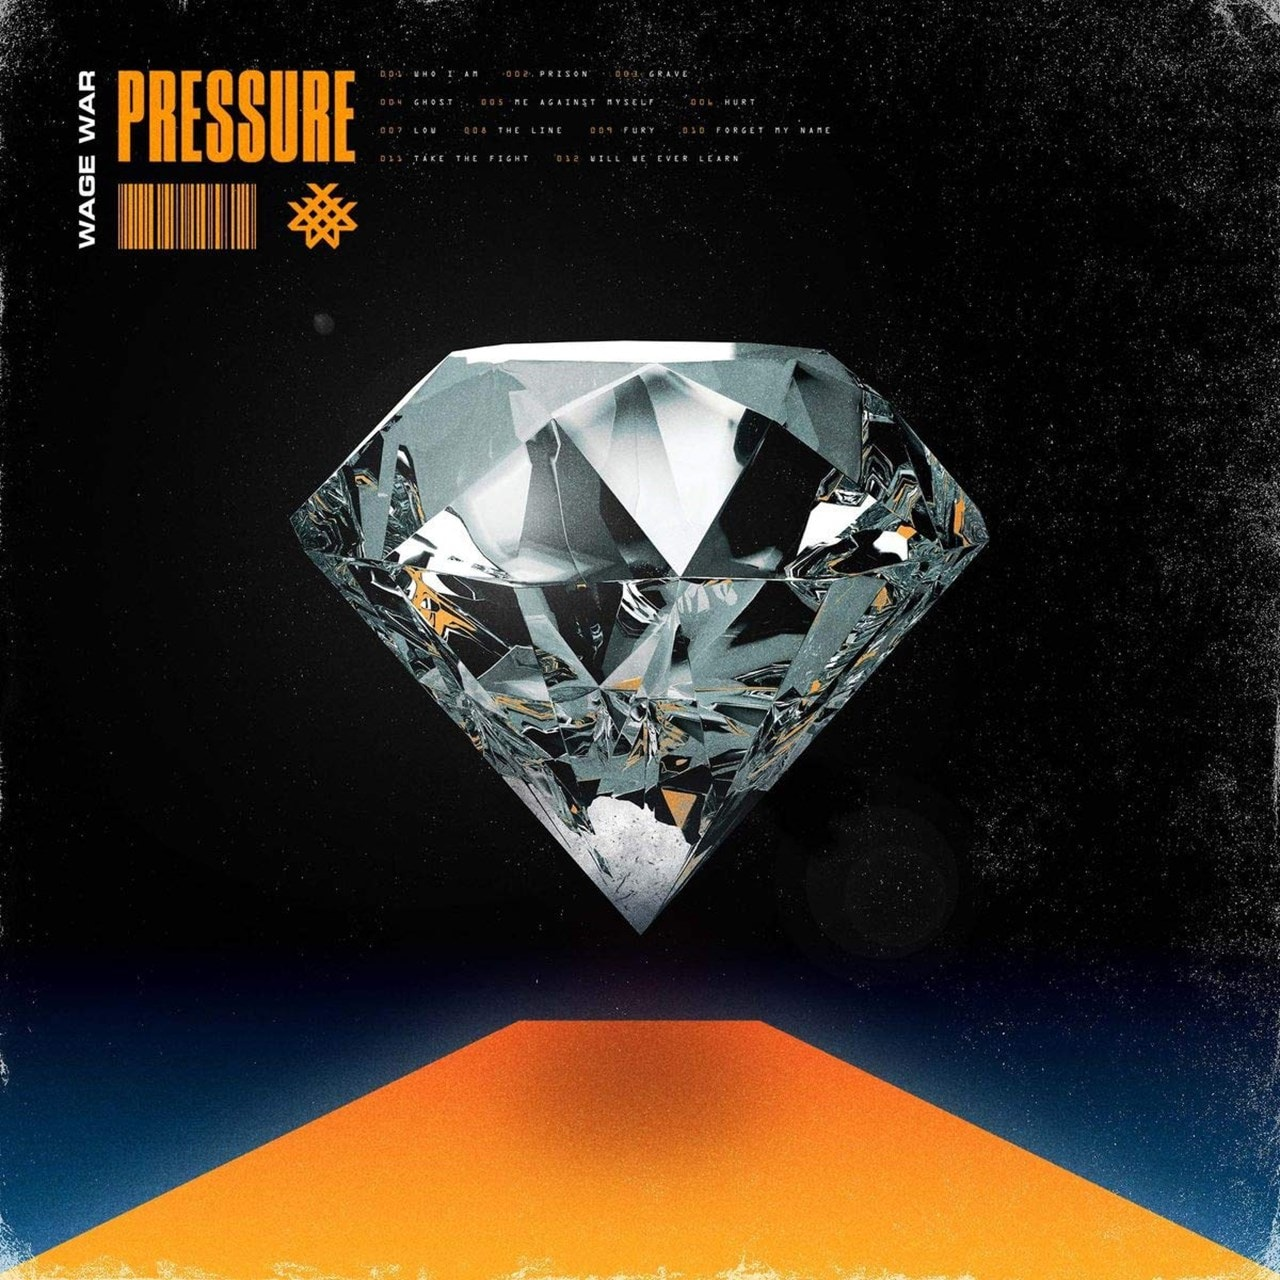 Pressure - 1